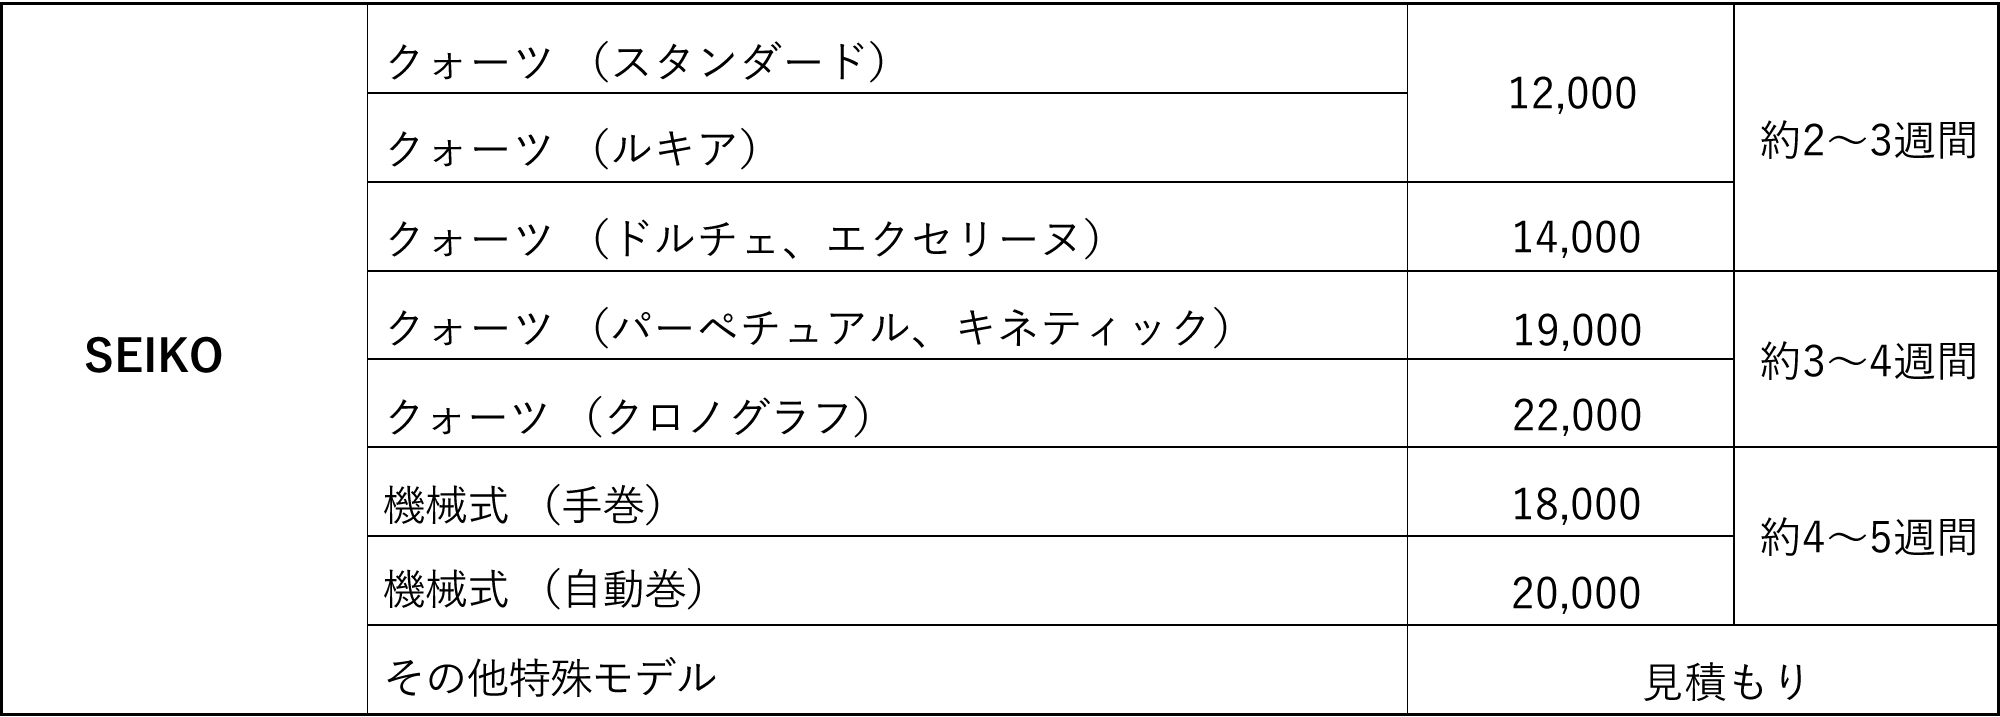 SEIKO オーバーホール料金表